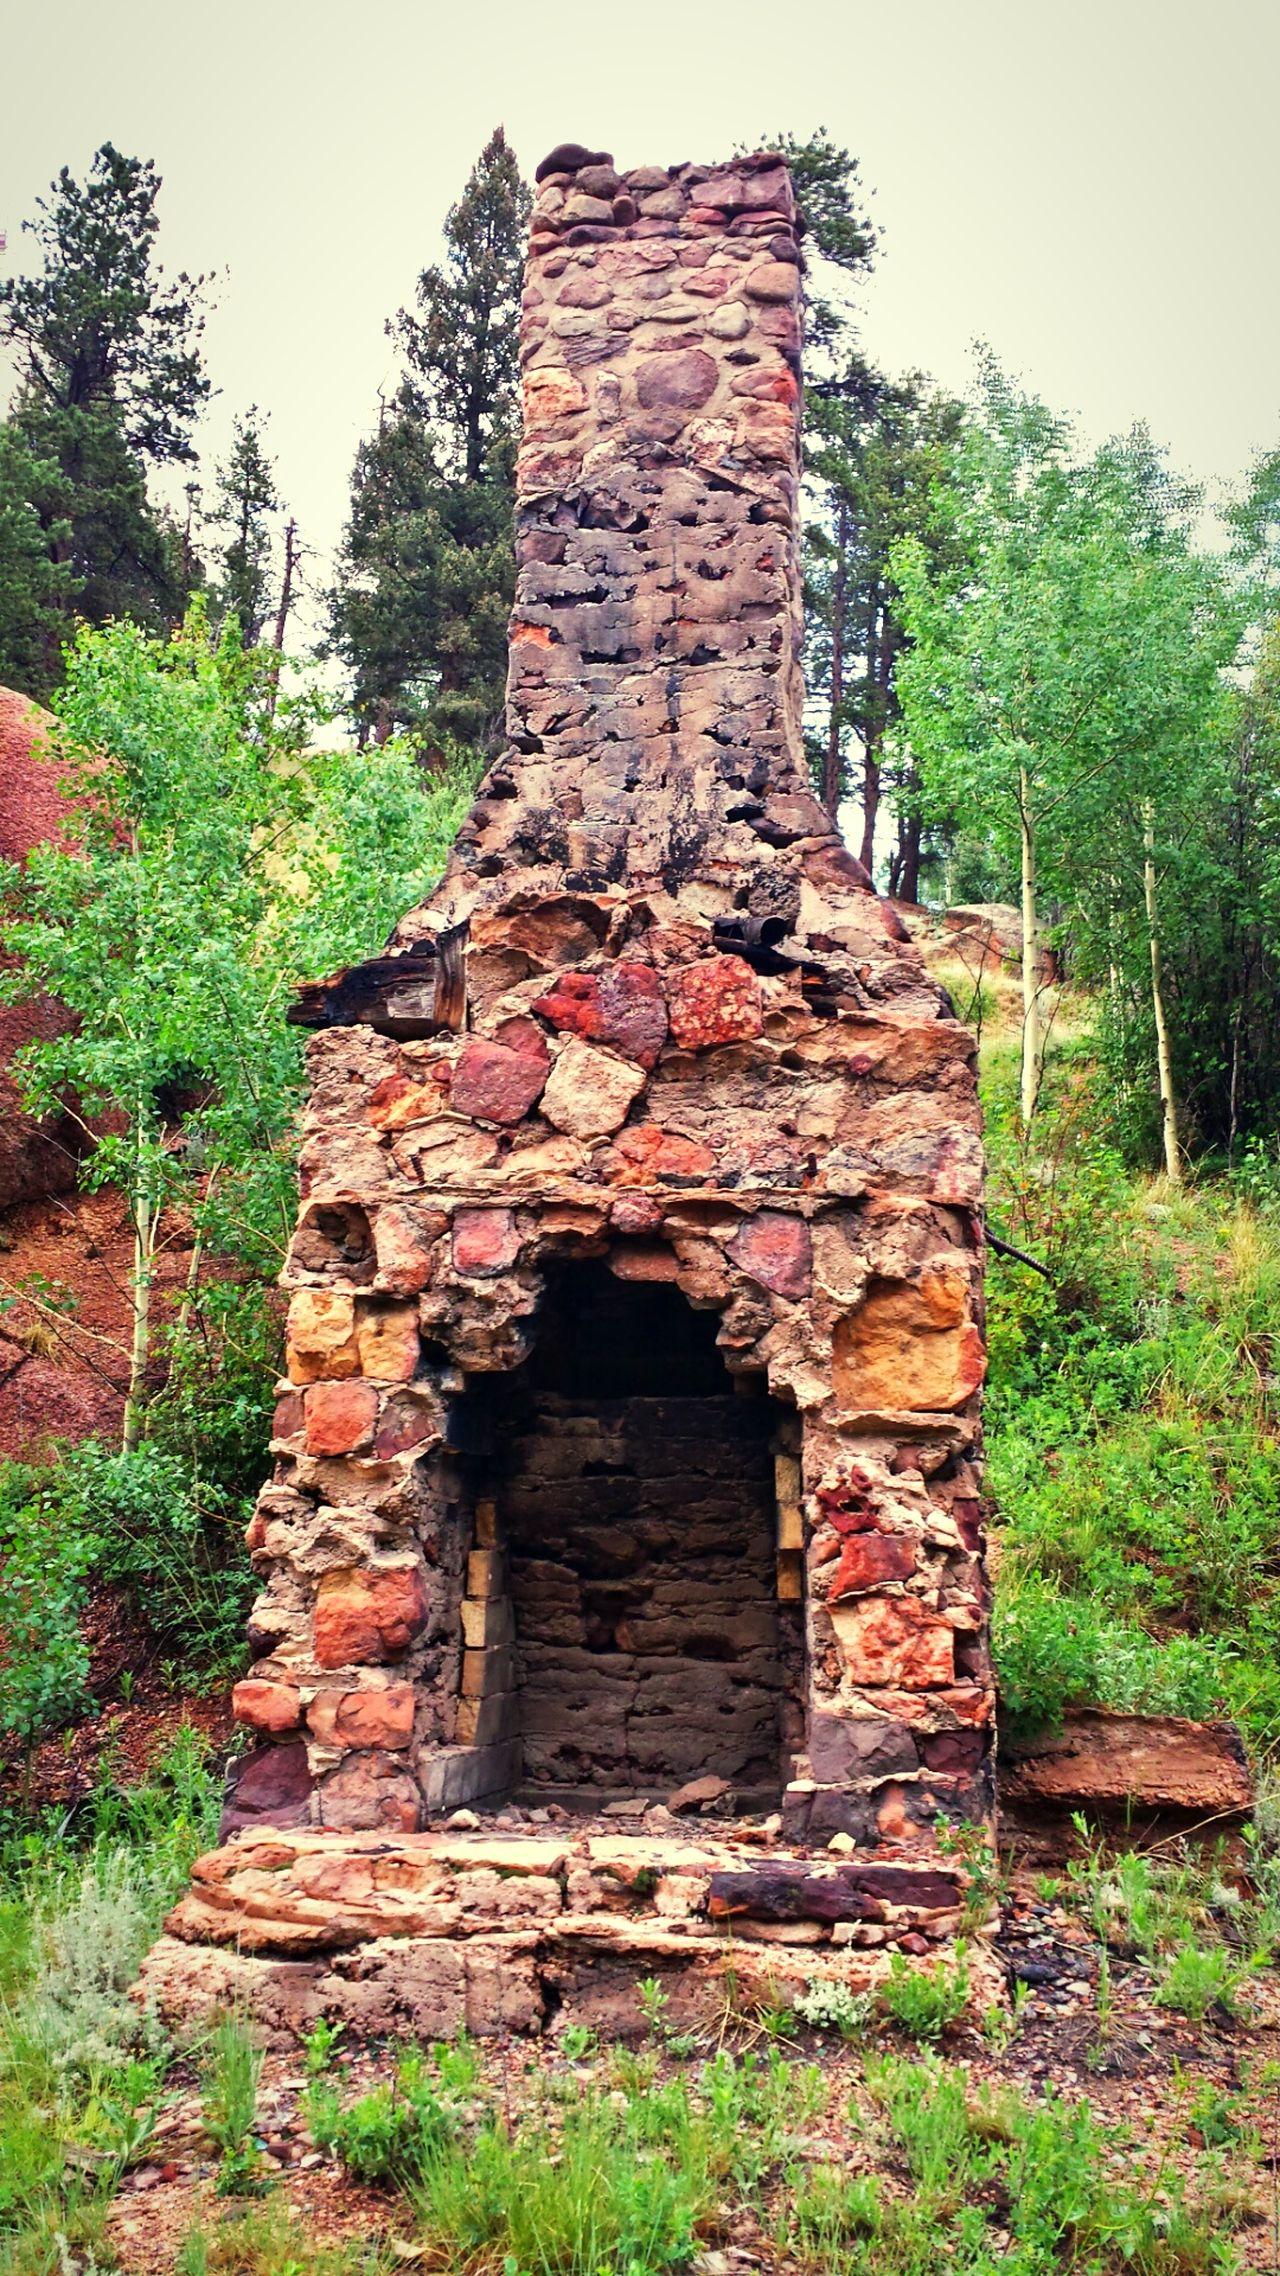 Wabi-sabi Abandoned Fireplace Hidden Gems